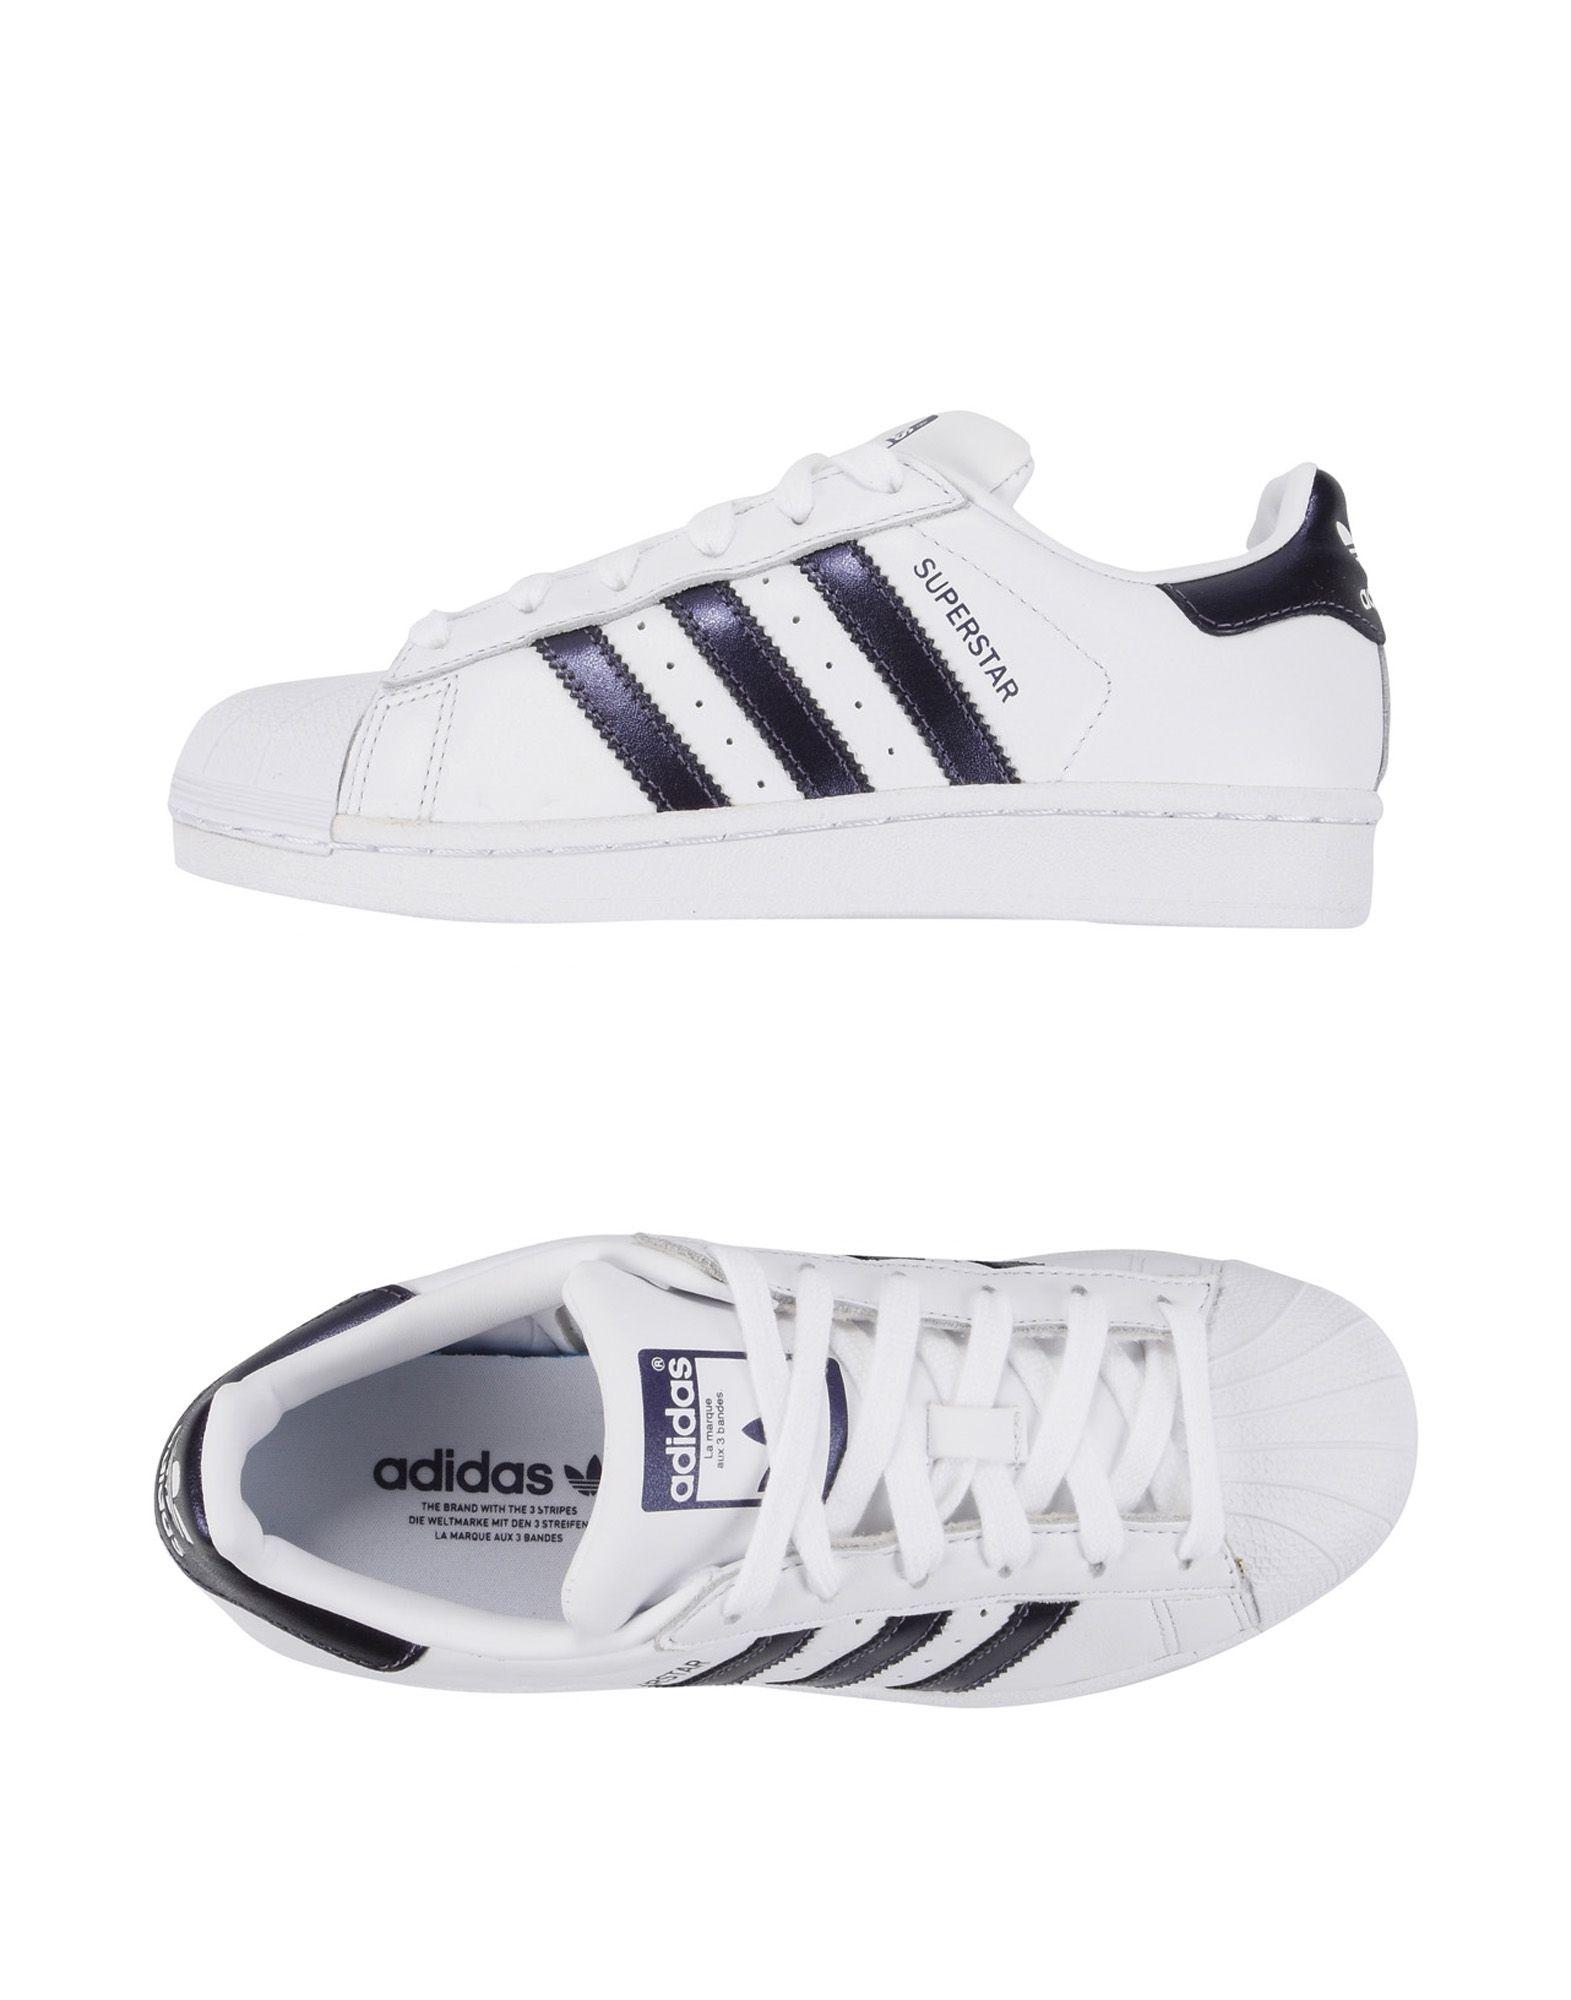 ADIDAS ORIGINALS Низкие кеды и кроссовки кеды adidas кеды superstar slipon w cblack cblack cwhite